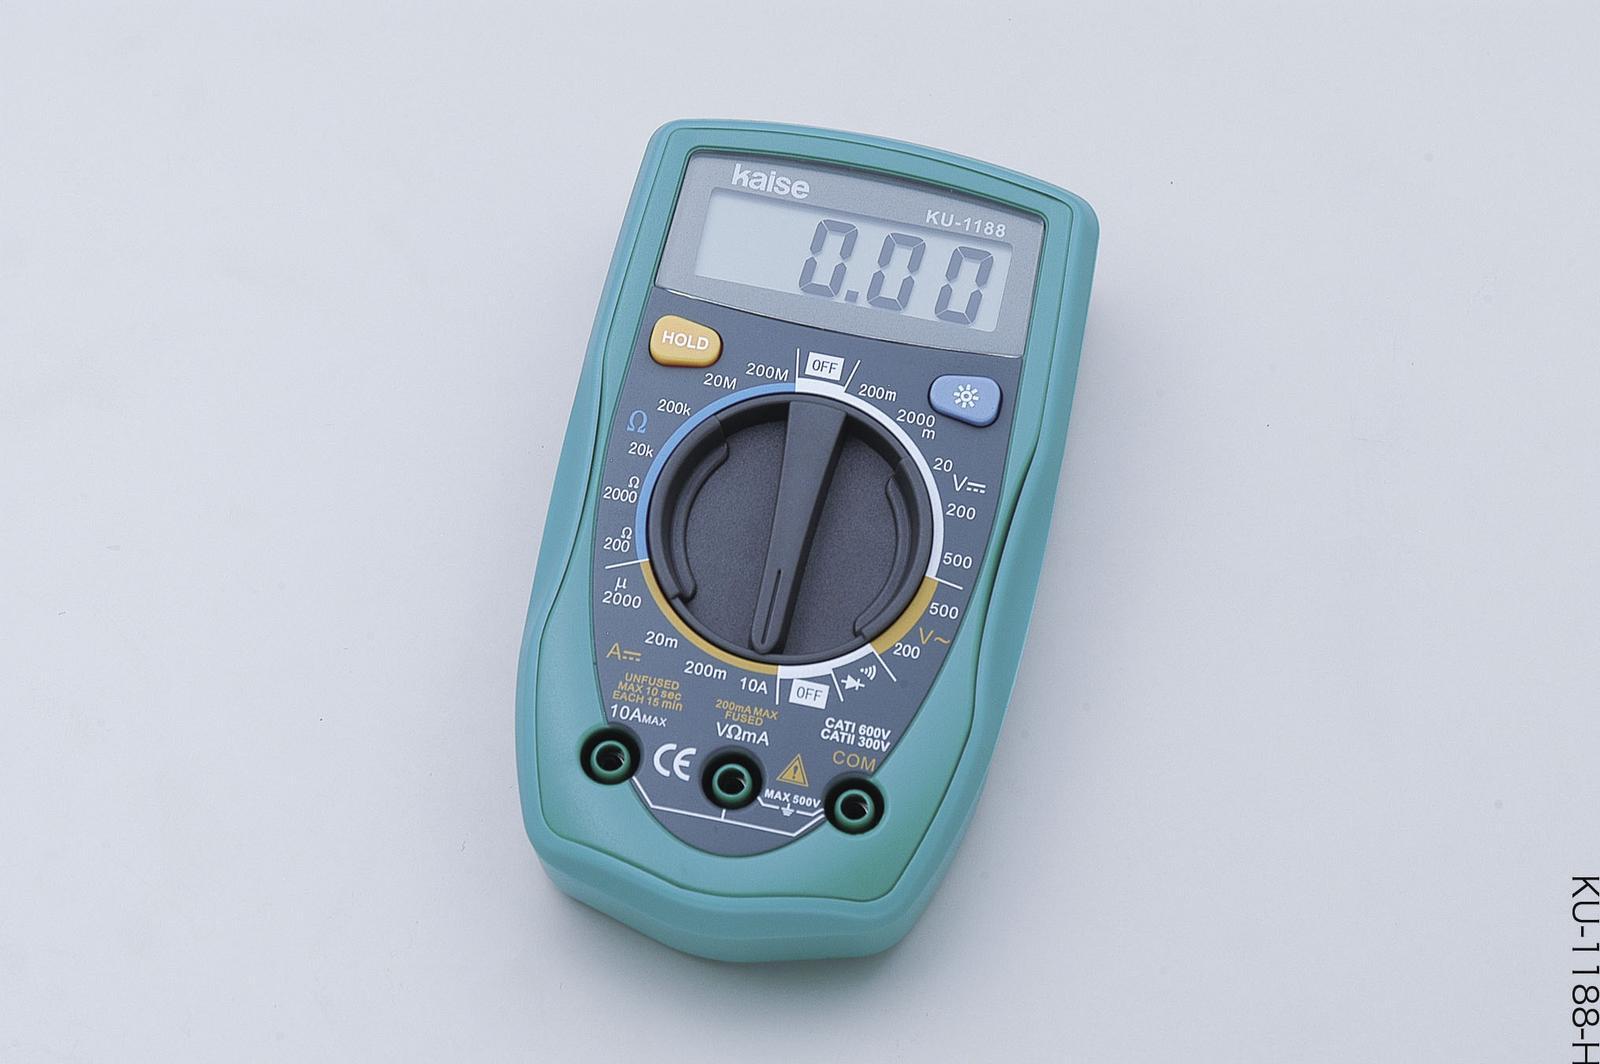 ELPA(エルパ) バックライト付き デジタルマルチメーター KU-1188【10P03Dec16】